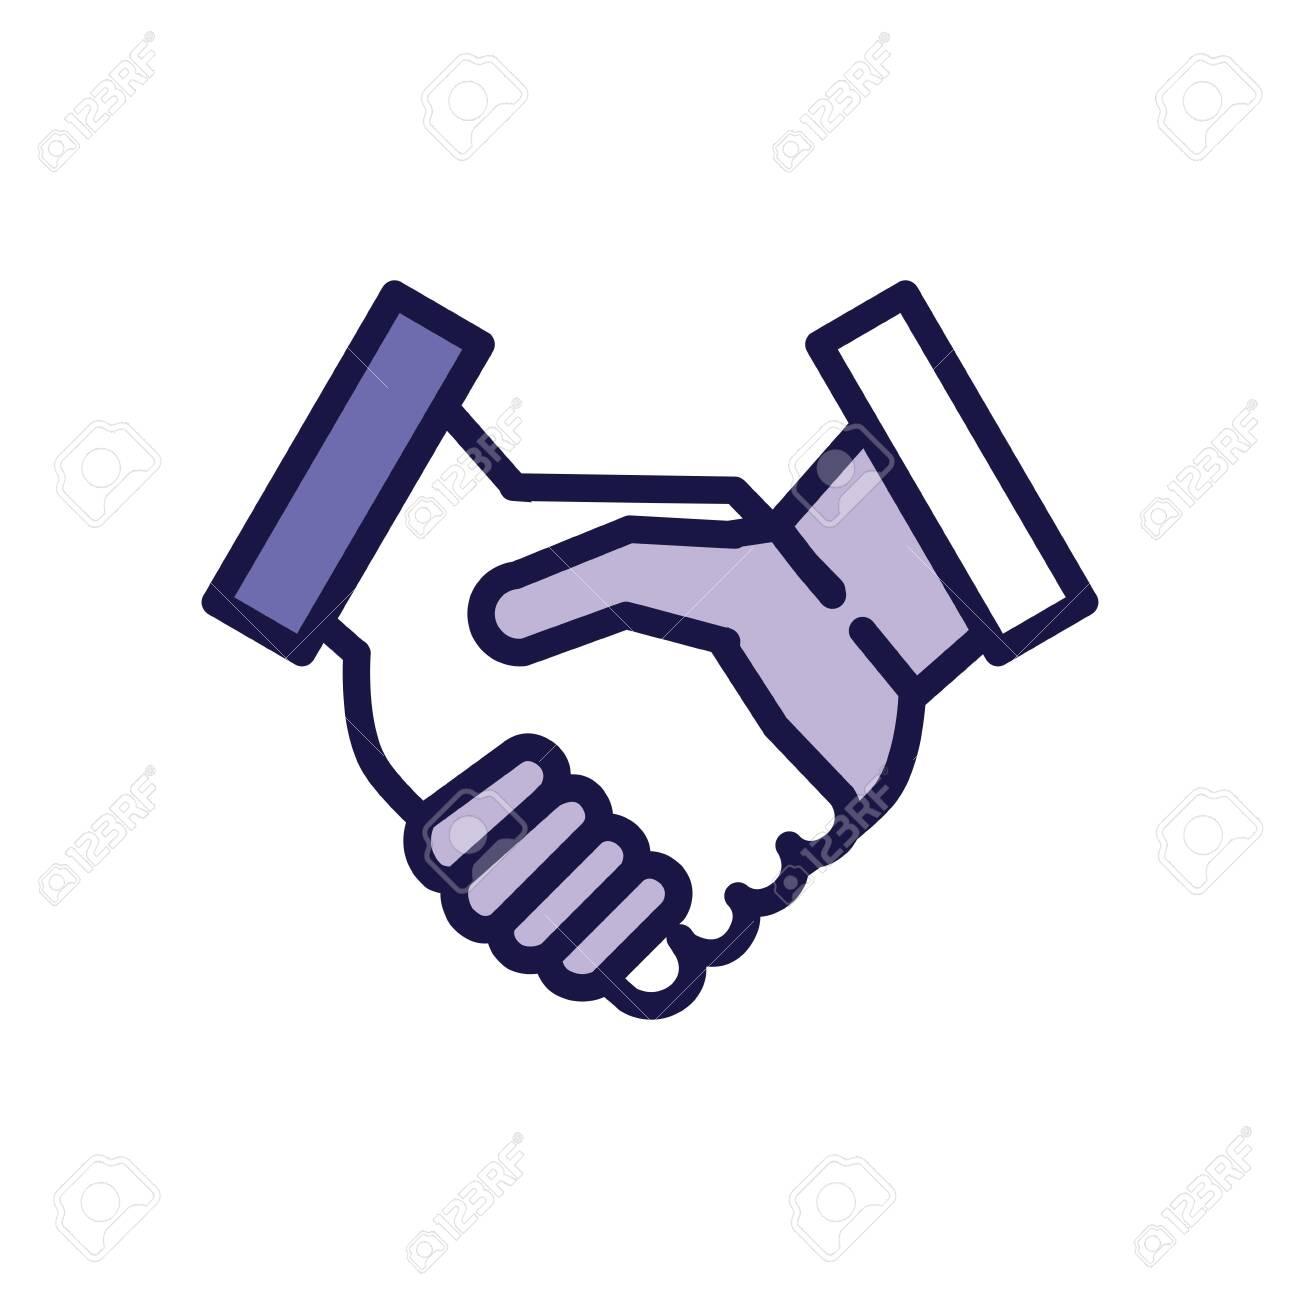 handshake greeting line style icon vector illustration design - 149762837